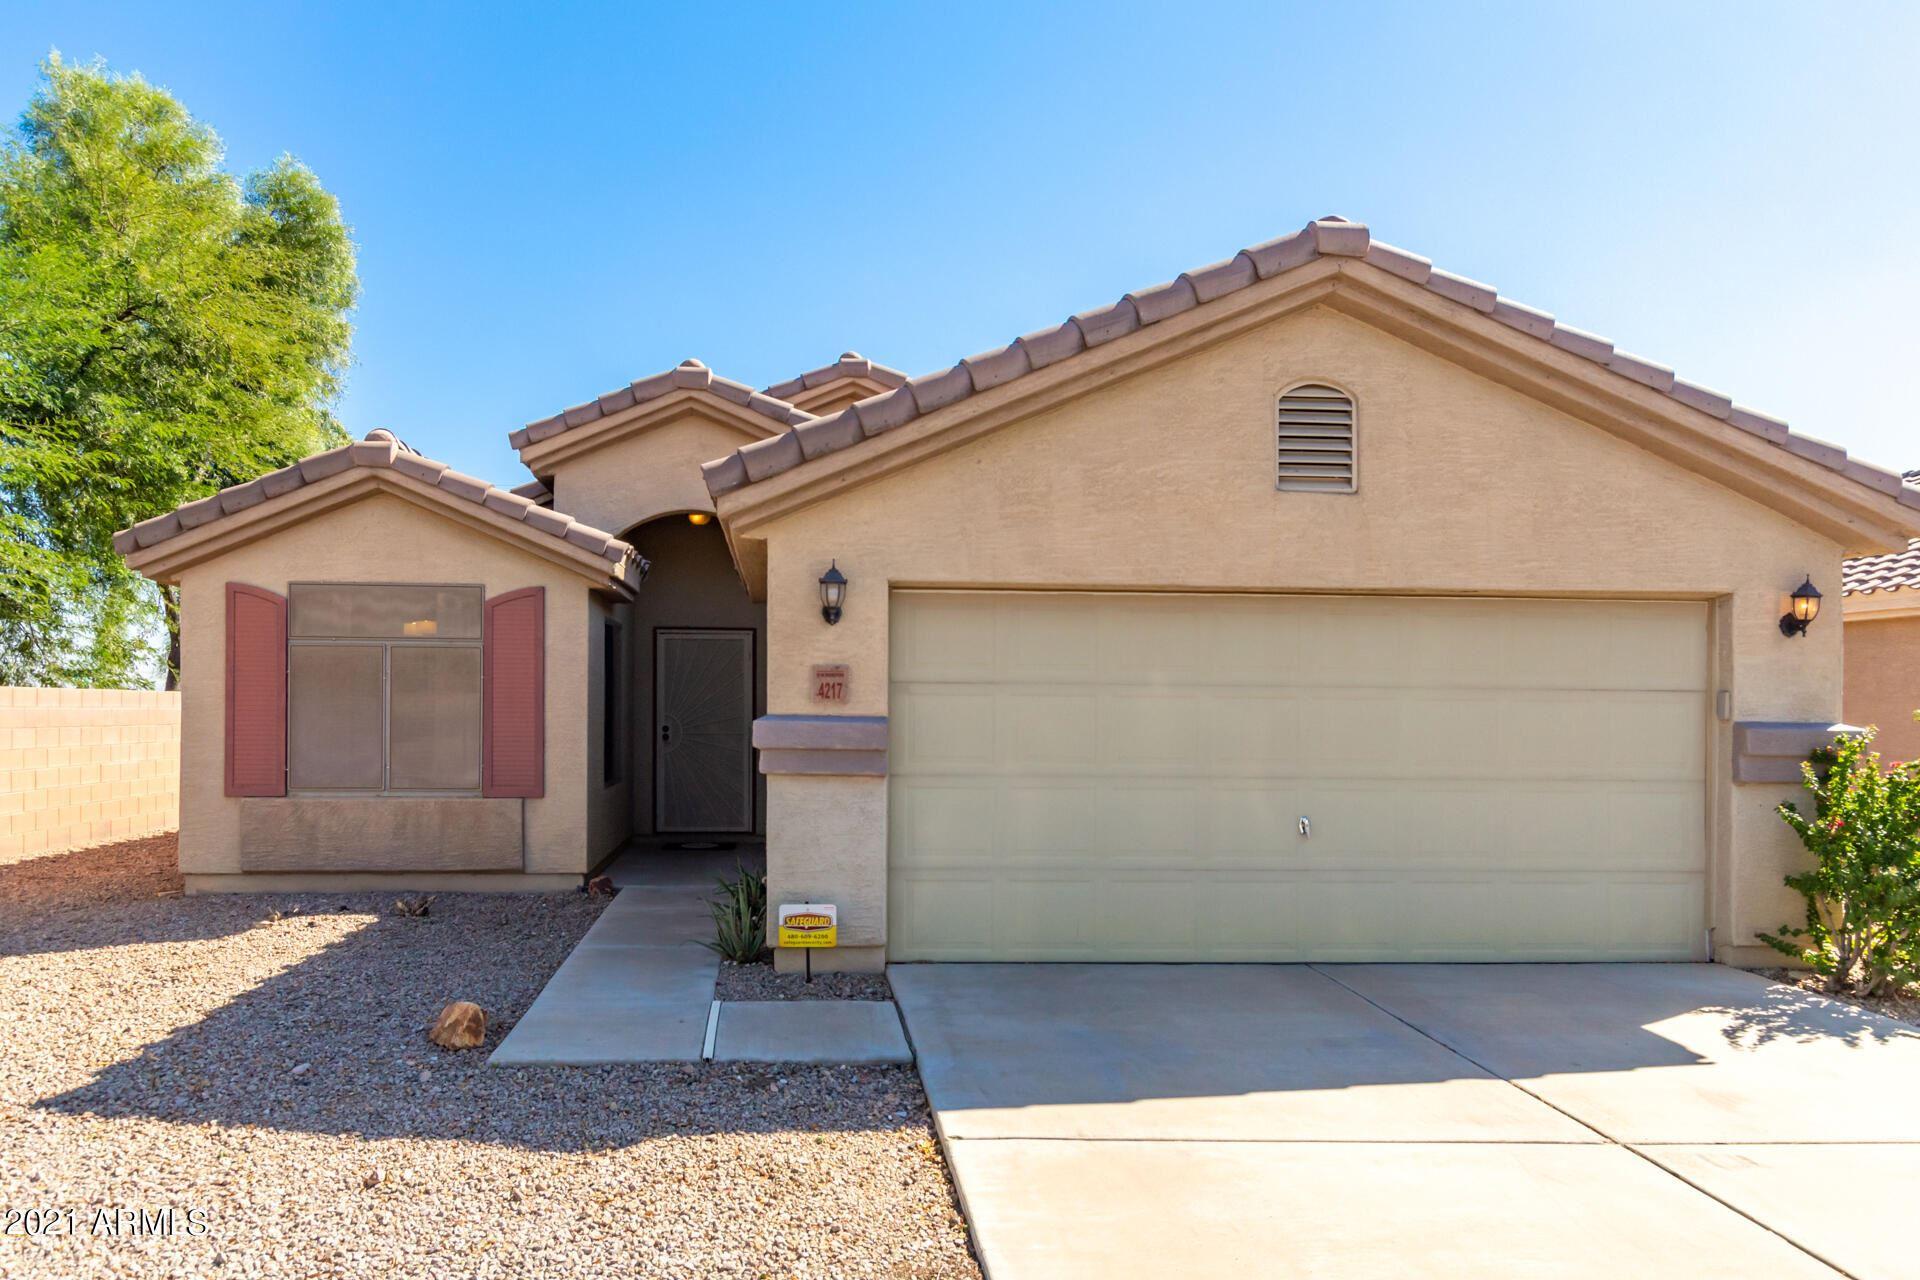 Photo of 4217 N 123RD Drive, Avondale, AZ 85392 (MLS # 6305536)